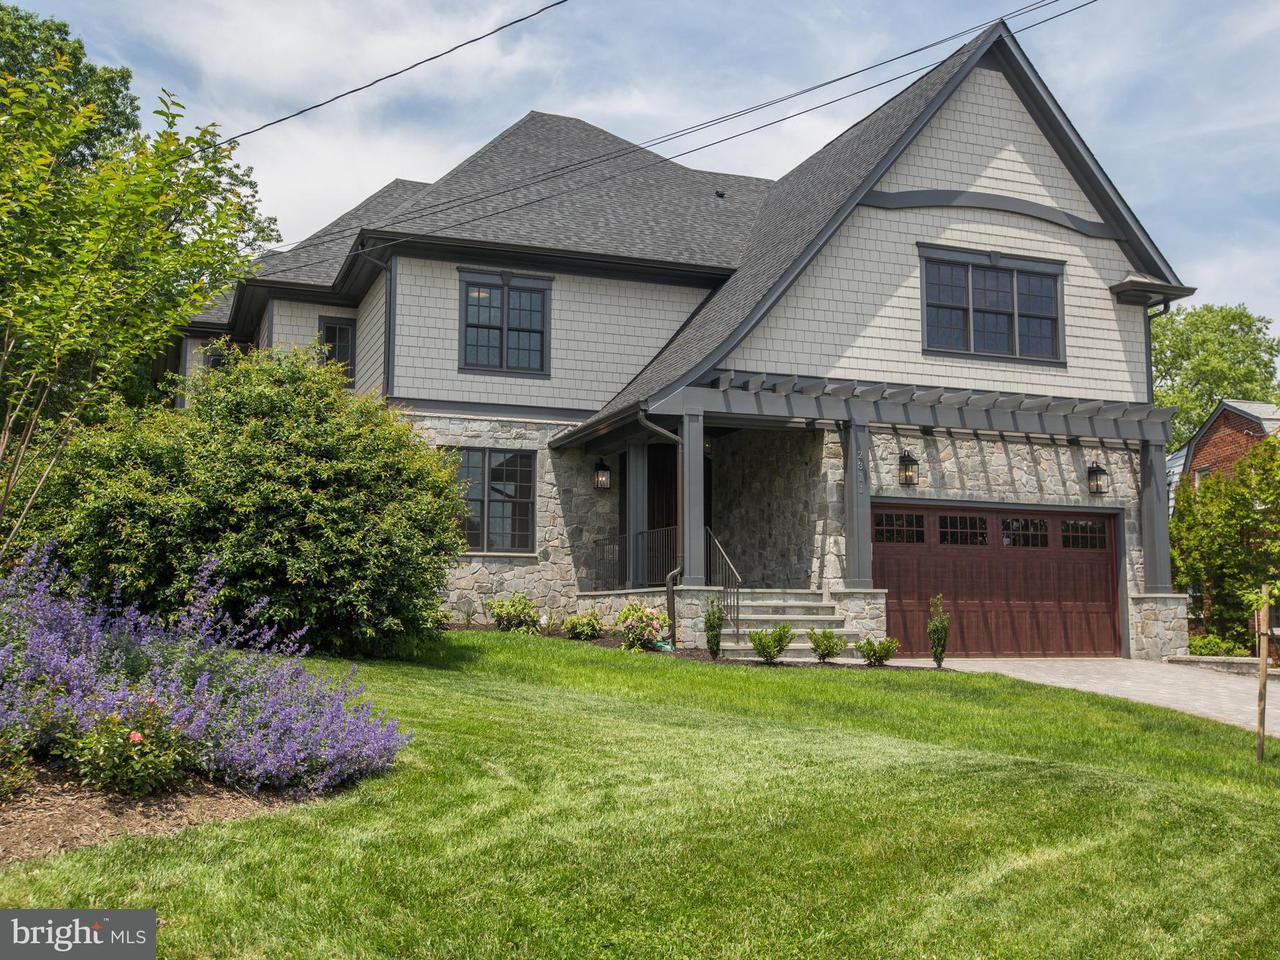 Single Family Home for Sale at 2311 Albemarle St N 2311 Albemarle St N Arlington, Virginia 22207 United States